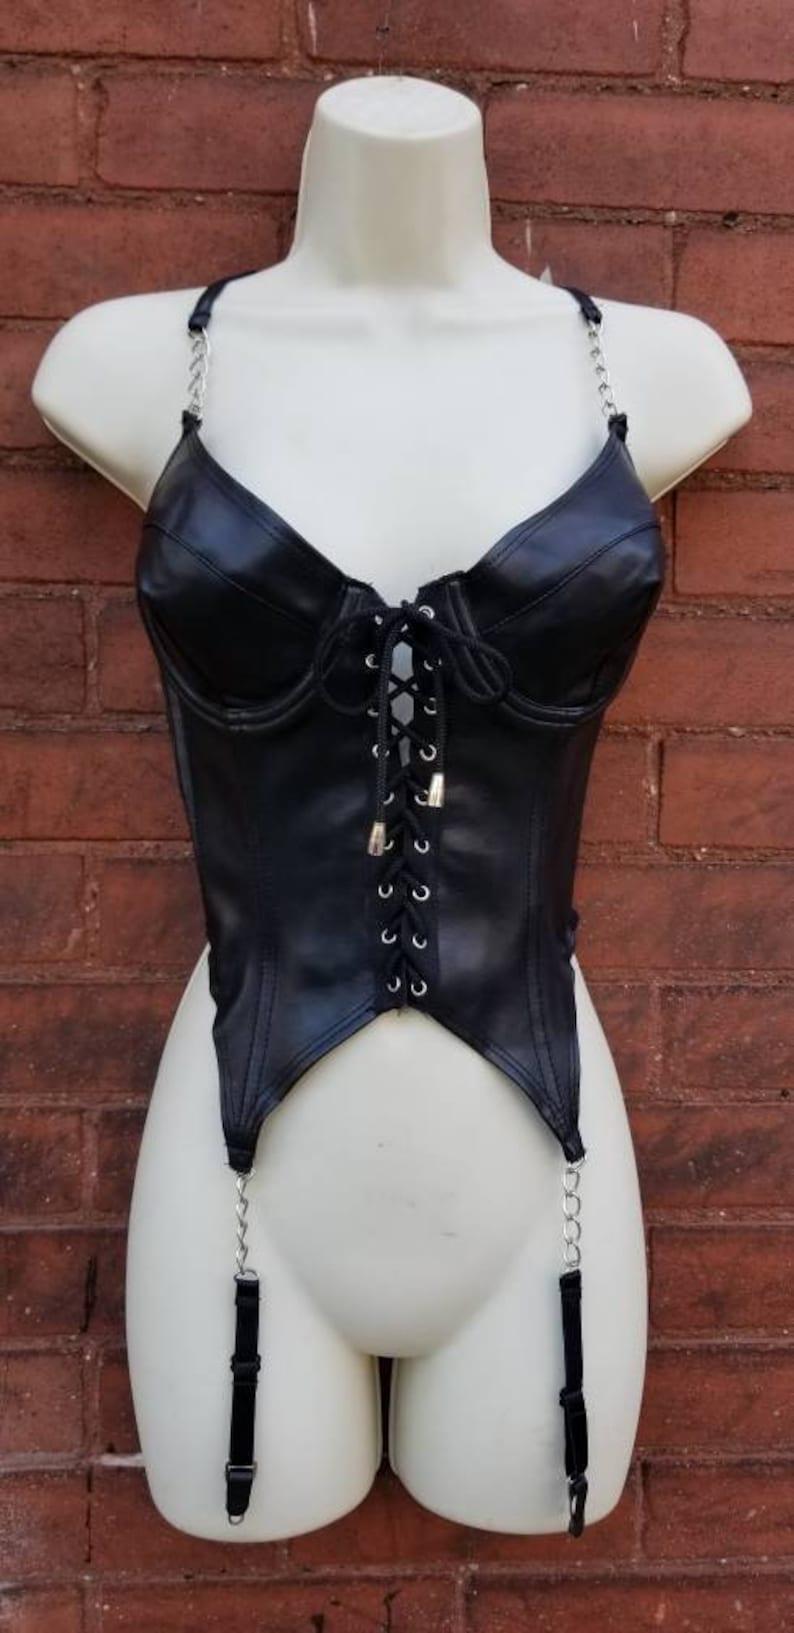 CHAIN LEATHER BODYSUIT Black Mesh Frederick/'s Of Hollywood S/&M Lace Up Underwire Bra Dancer Goth Witch Dominatrix Dancer 90/'s Garter Belt 36